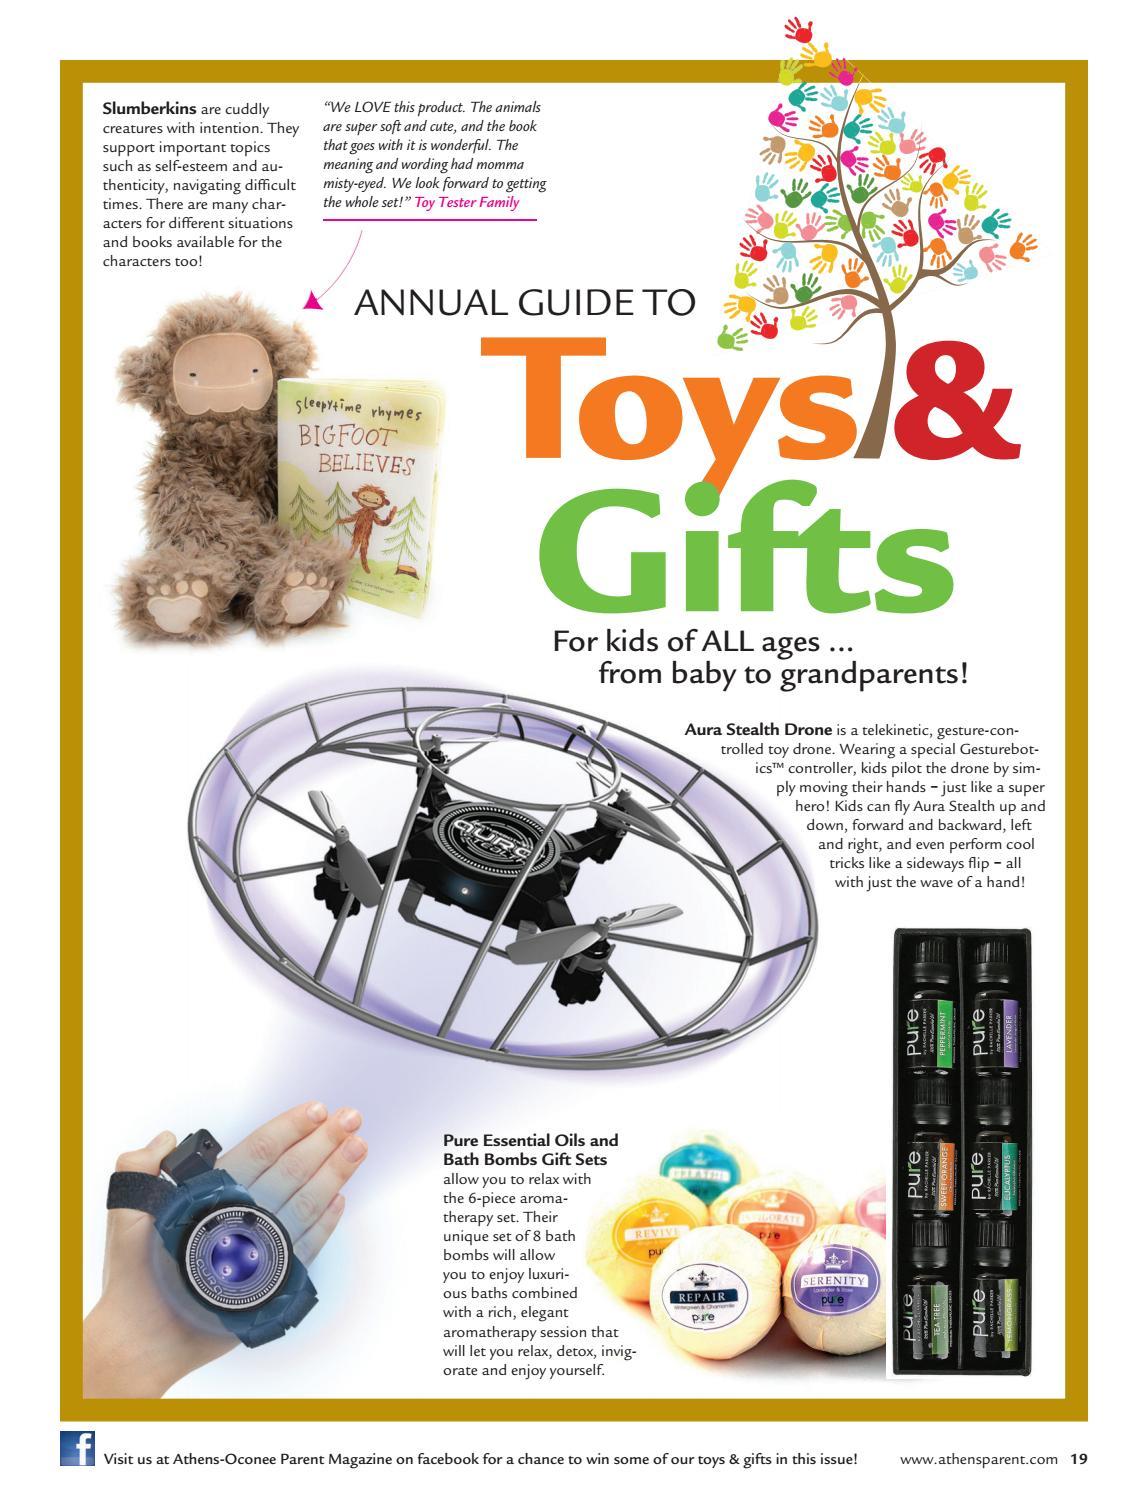 Athens Oconee Parent Magazine Dec2018 by Steve Kelleher - issuu